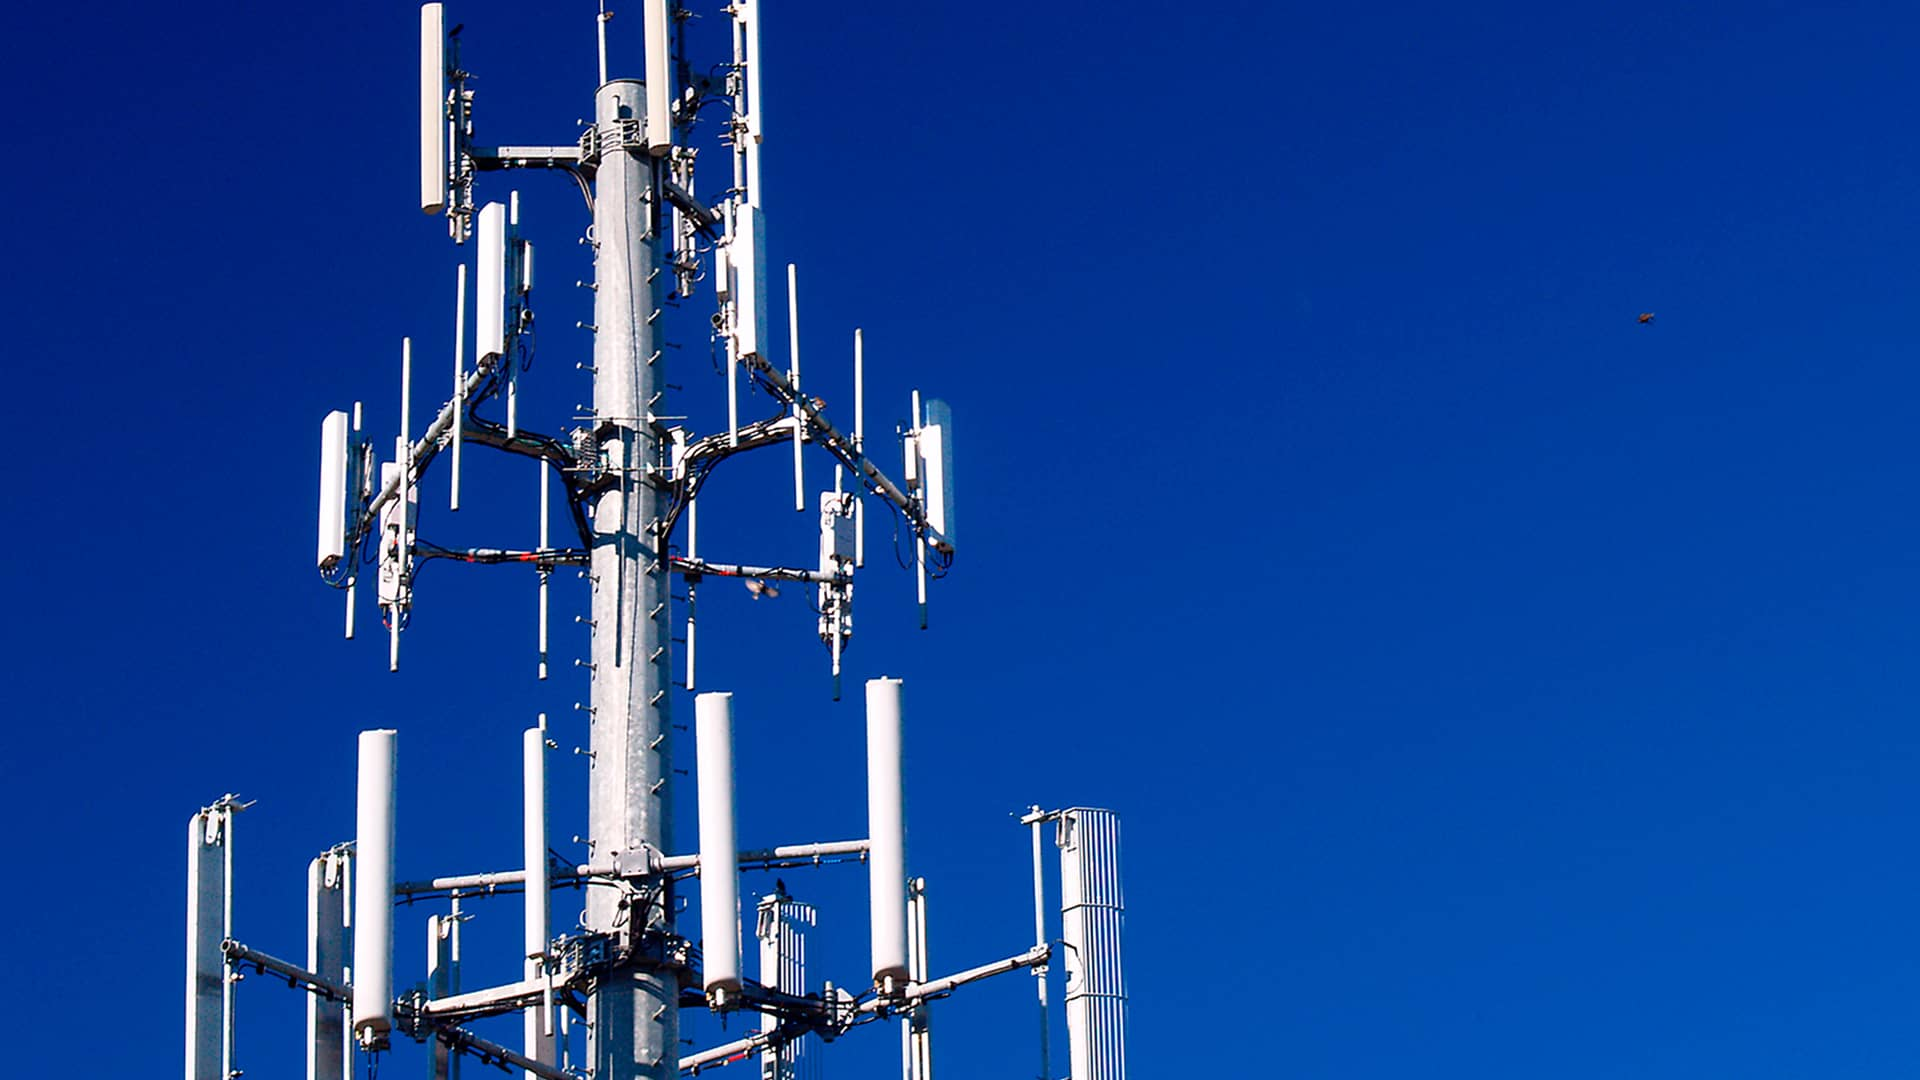 Antena telefónica 5g iot